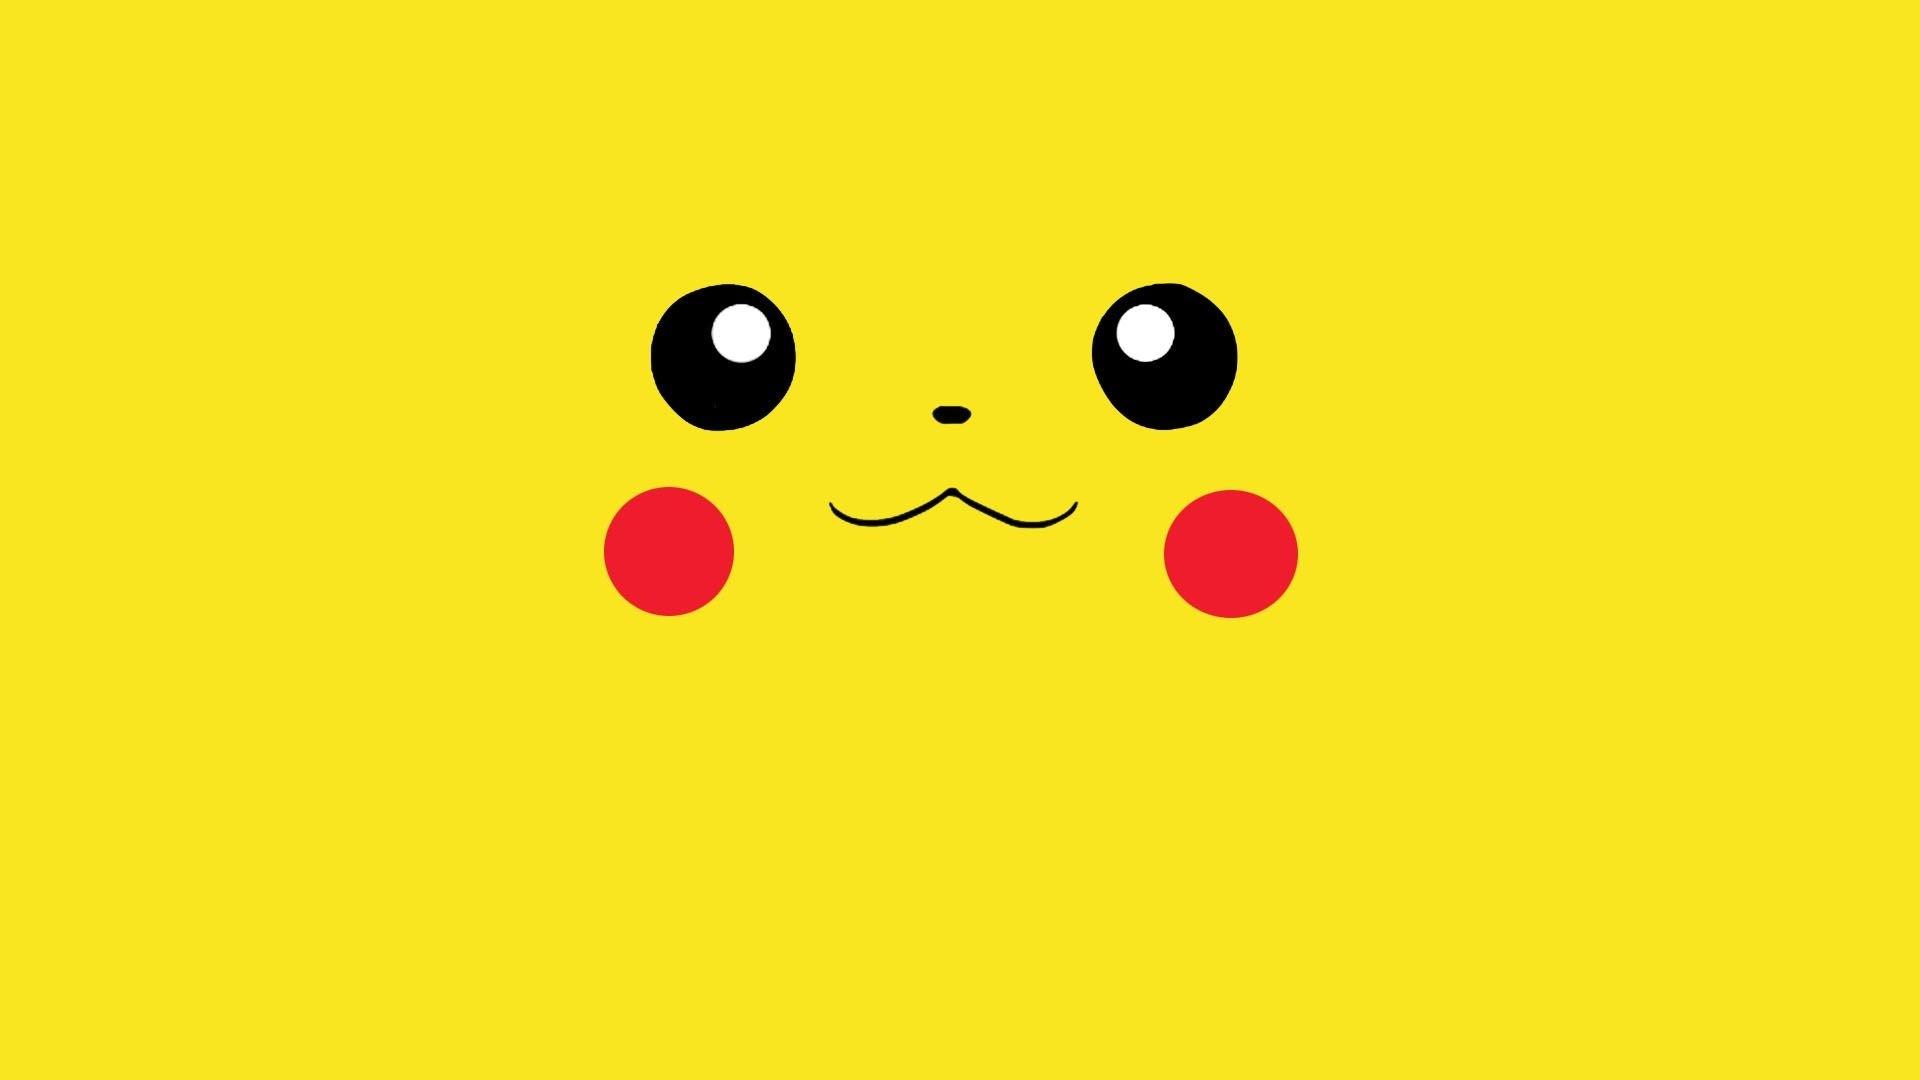 Cute Yellow hd wallpaper download